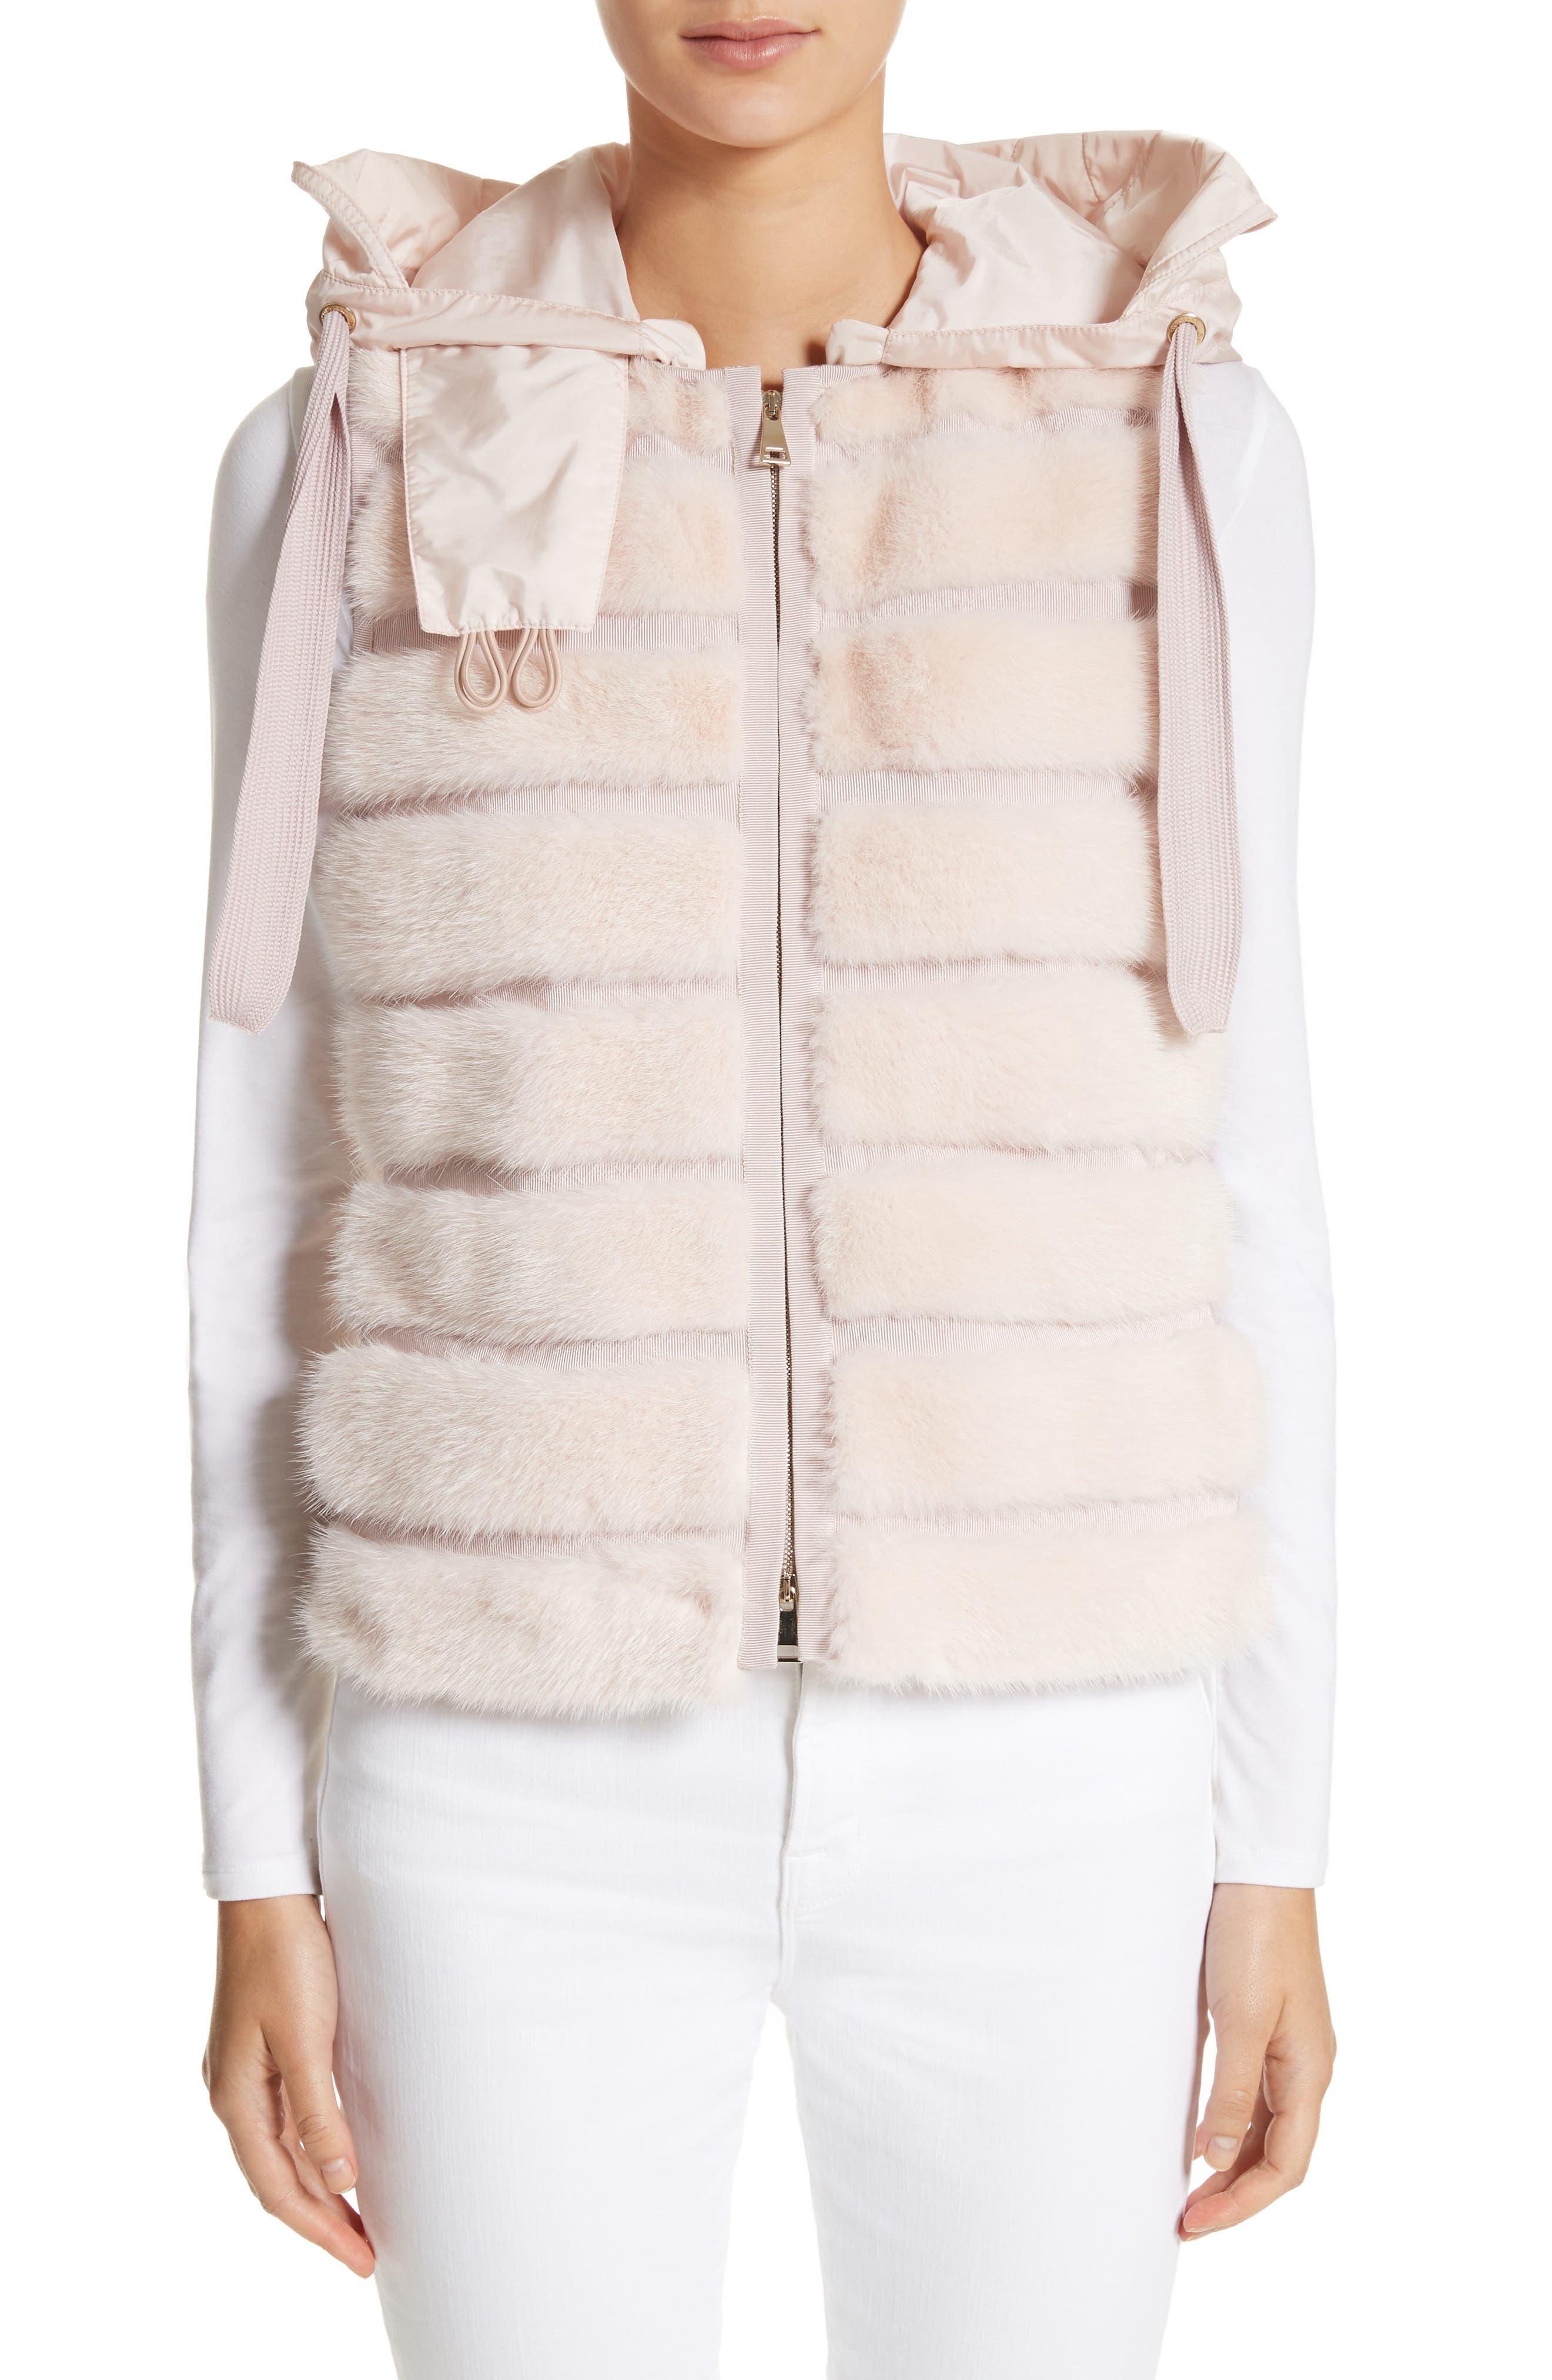 Ametrine Wool & Cashmere Vest with Genuine Mink Fur Trim & Removable Hood,                             Main thumbnail 1, color,                             Blush